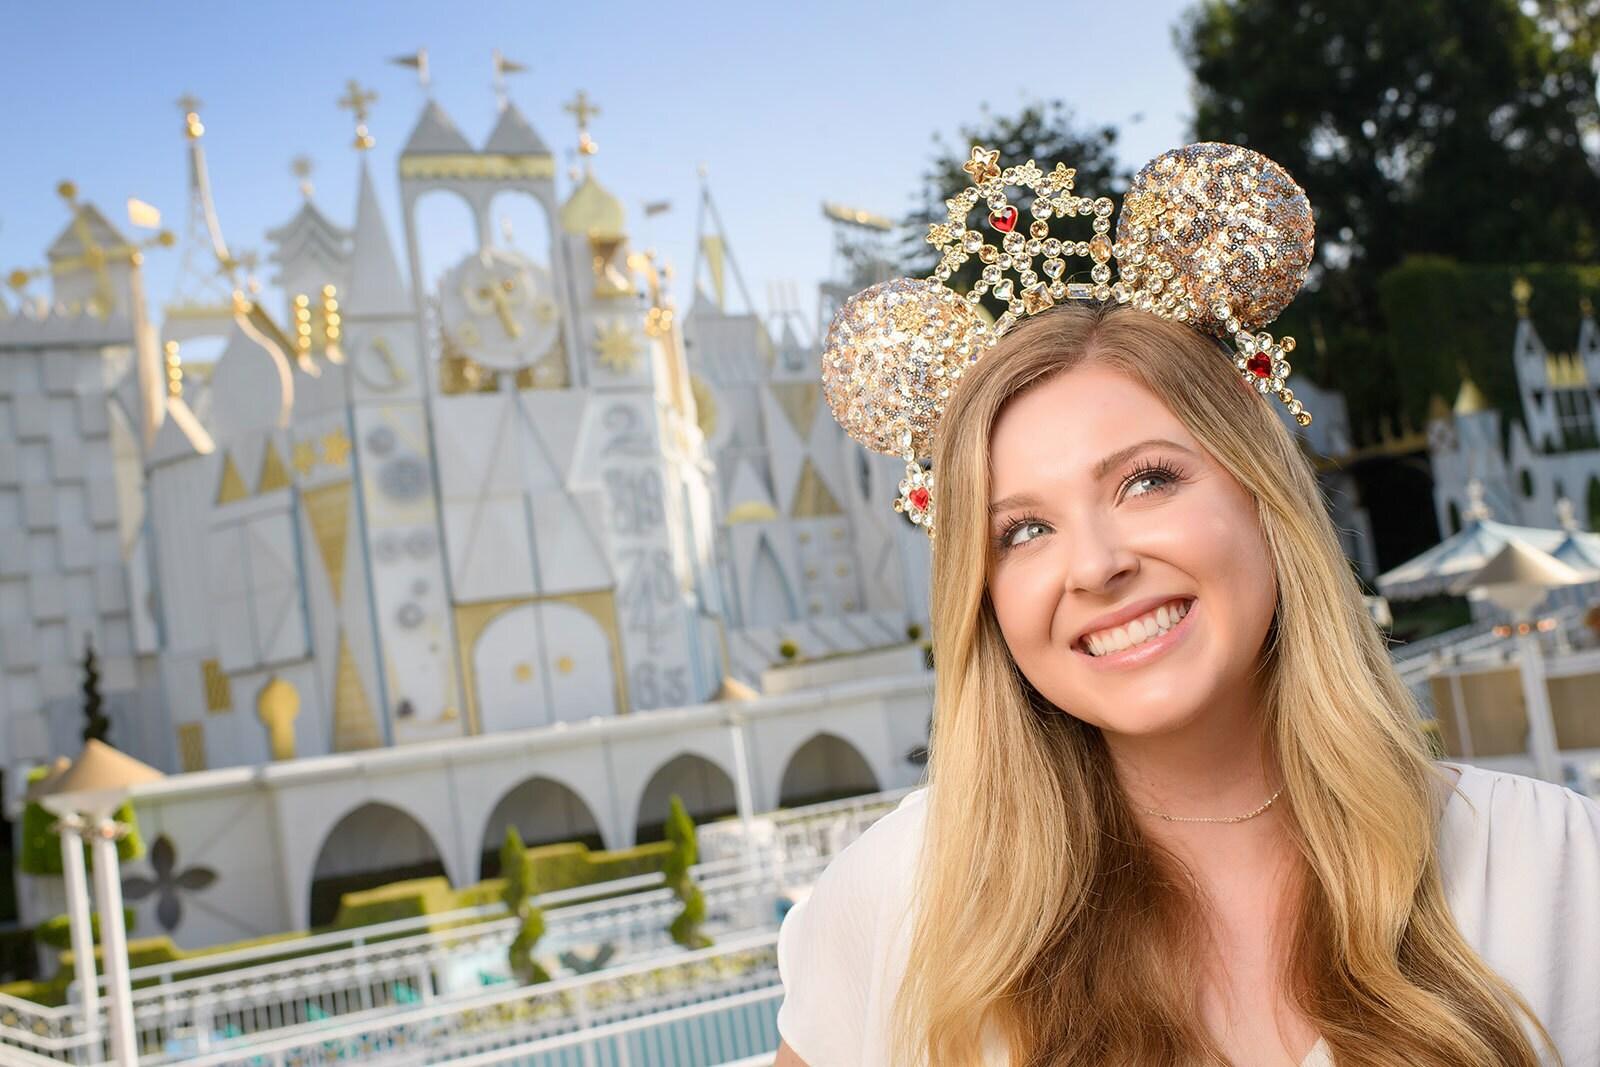 Heidi Klum wearing her designer Minnie Mouse Ear Headband at Disneyland Resort